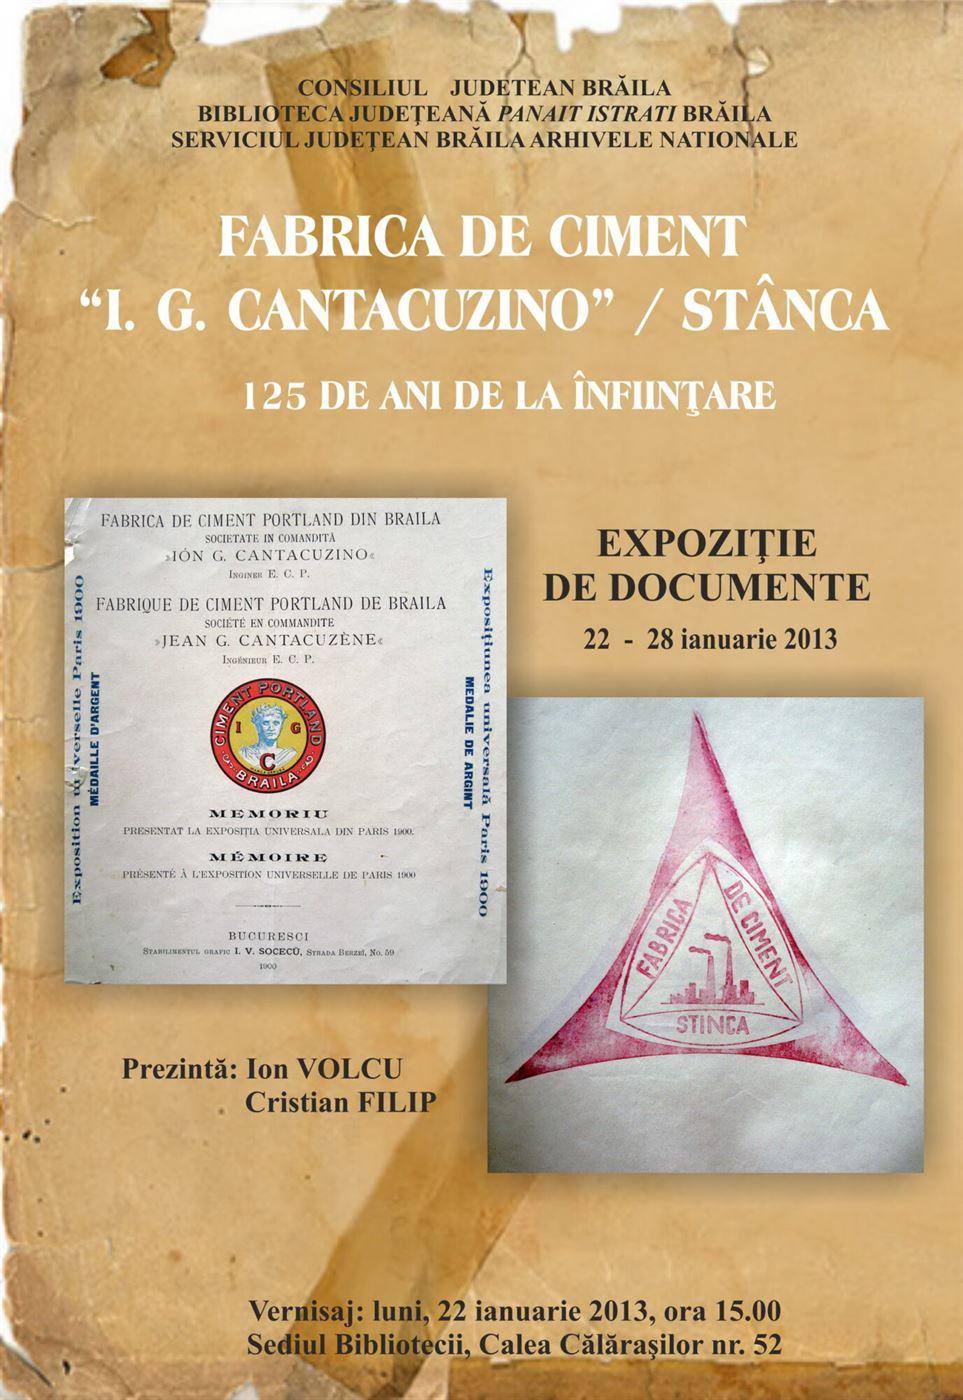 Sunteti invitati la vernisajul expozitiei Fabrica de Ciment I.G.Cantacuzino / Stanca